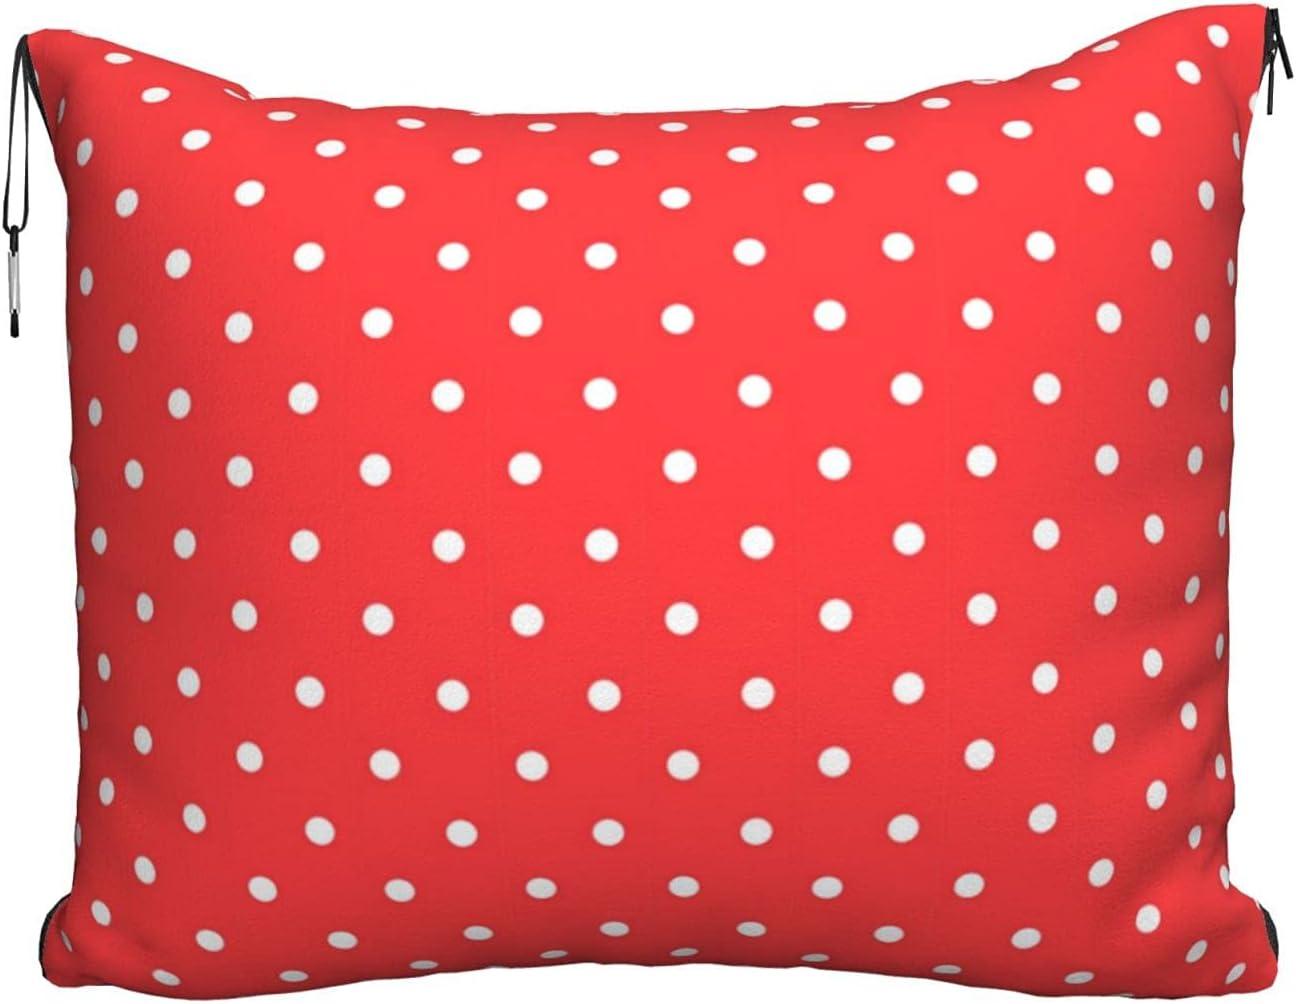 Mescchskred service and White Polka Dots Blanket Travel Pillow Com Max 53% OFF Print